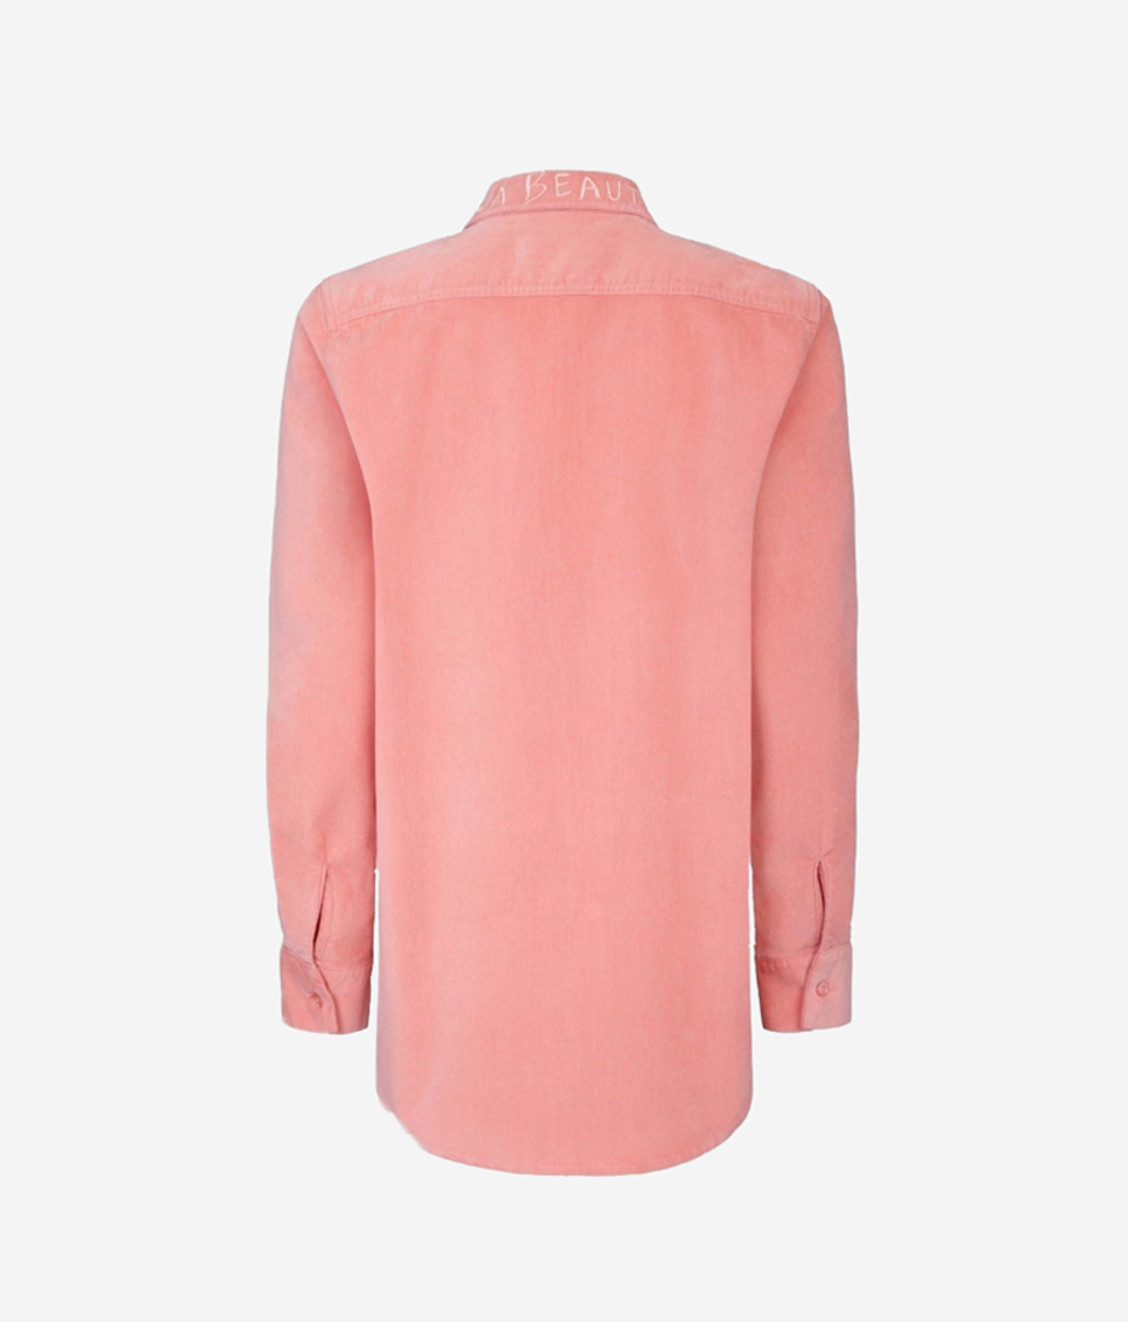 Etre Cecile Etre Cecile Eiffel Tower Girlfriend Shirt Pink